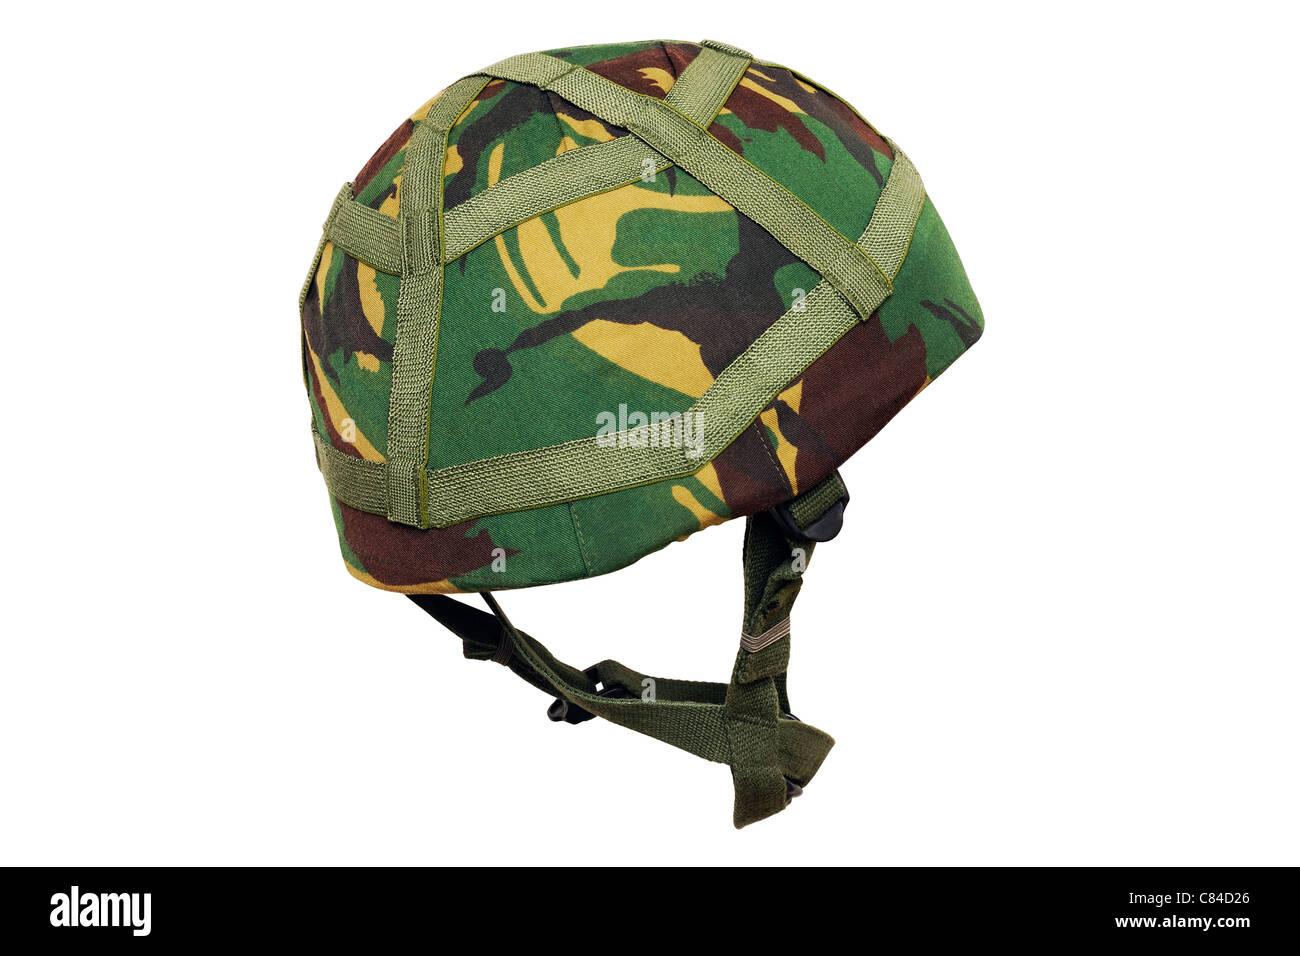 Armee-Helm. Britische Armee Thema MK.6 Kevlar Kampf Helm. Stockfoto